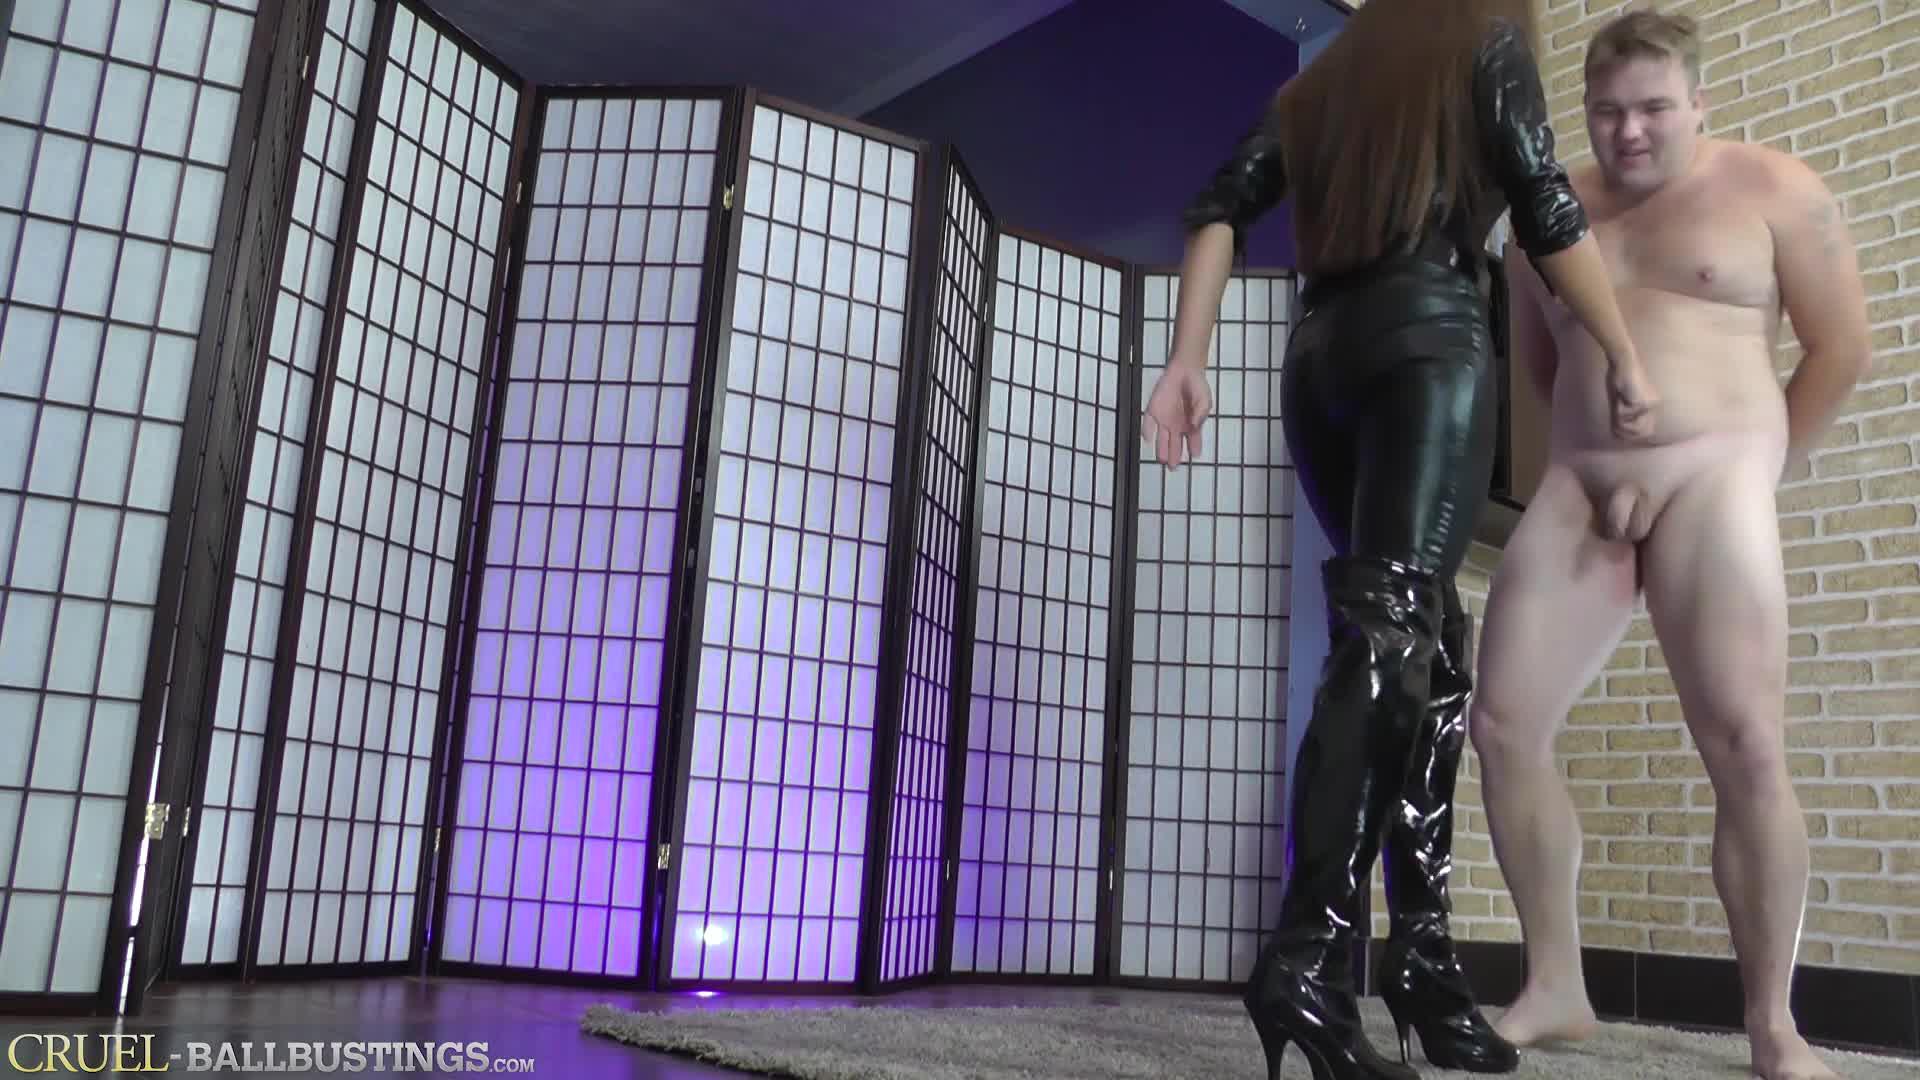 Mistress Humiliate Her Slave